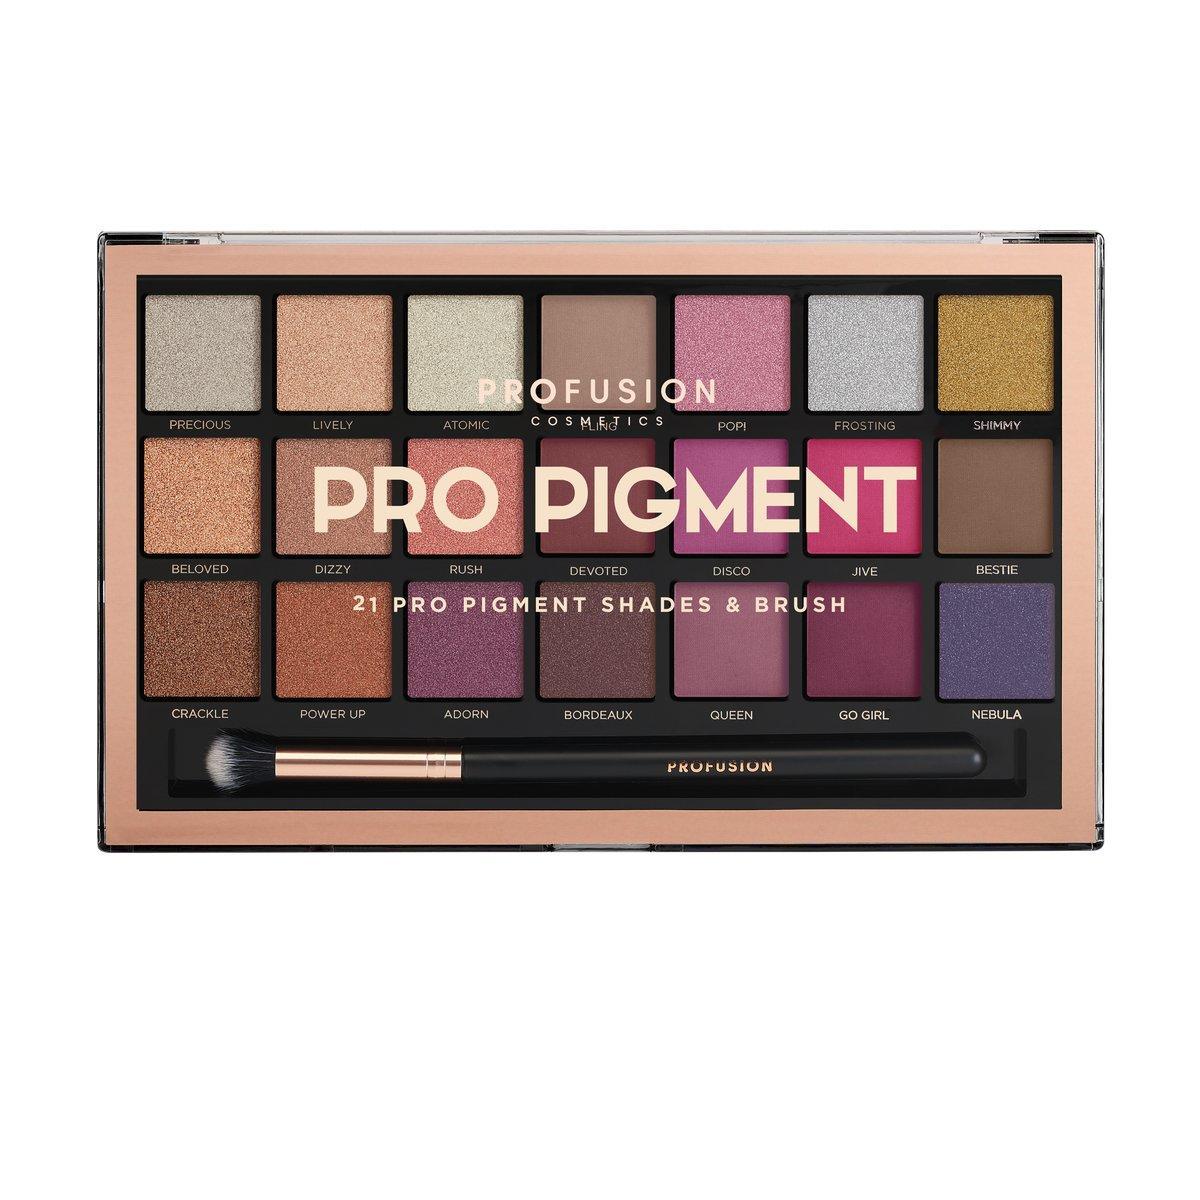 Profusion Cosmetics Pro Pigment Palette